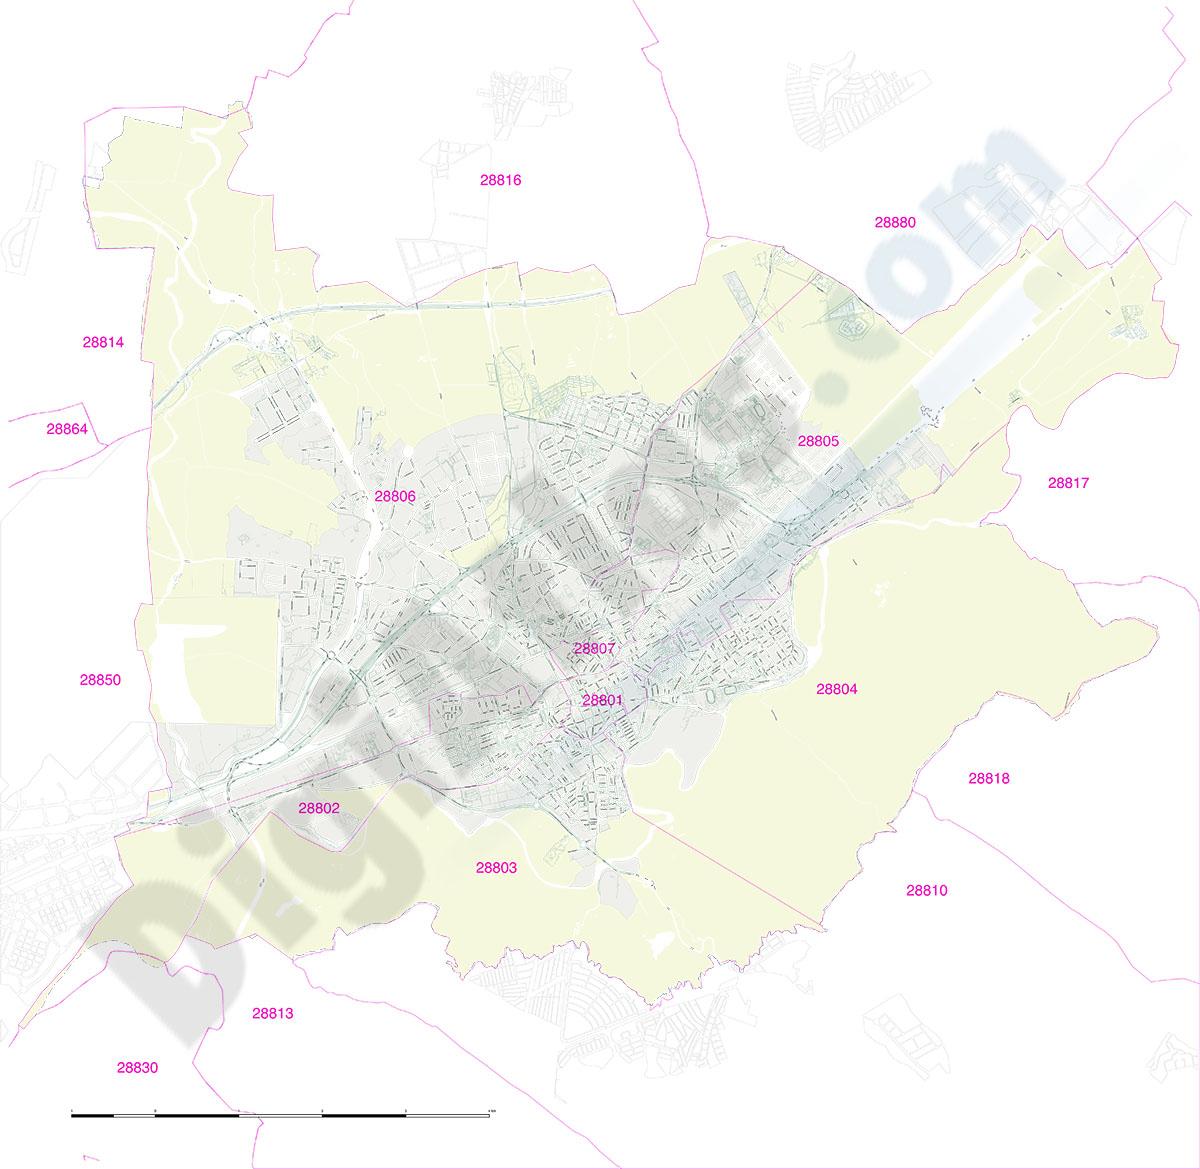 Alcala de Henares city map with postcode districts